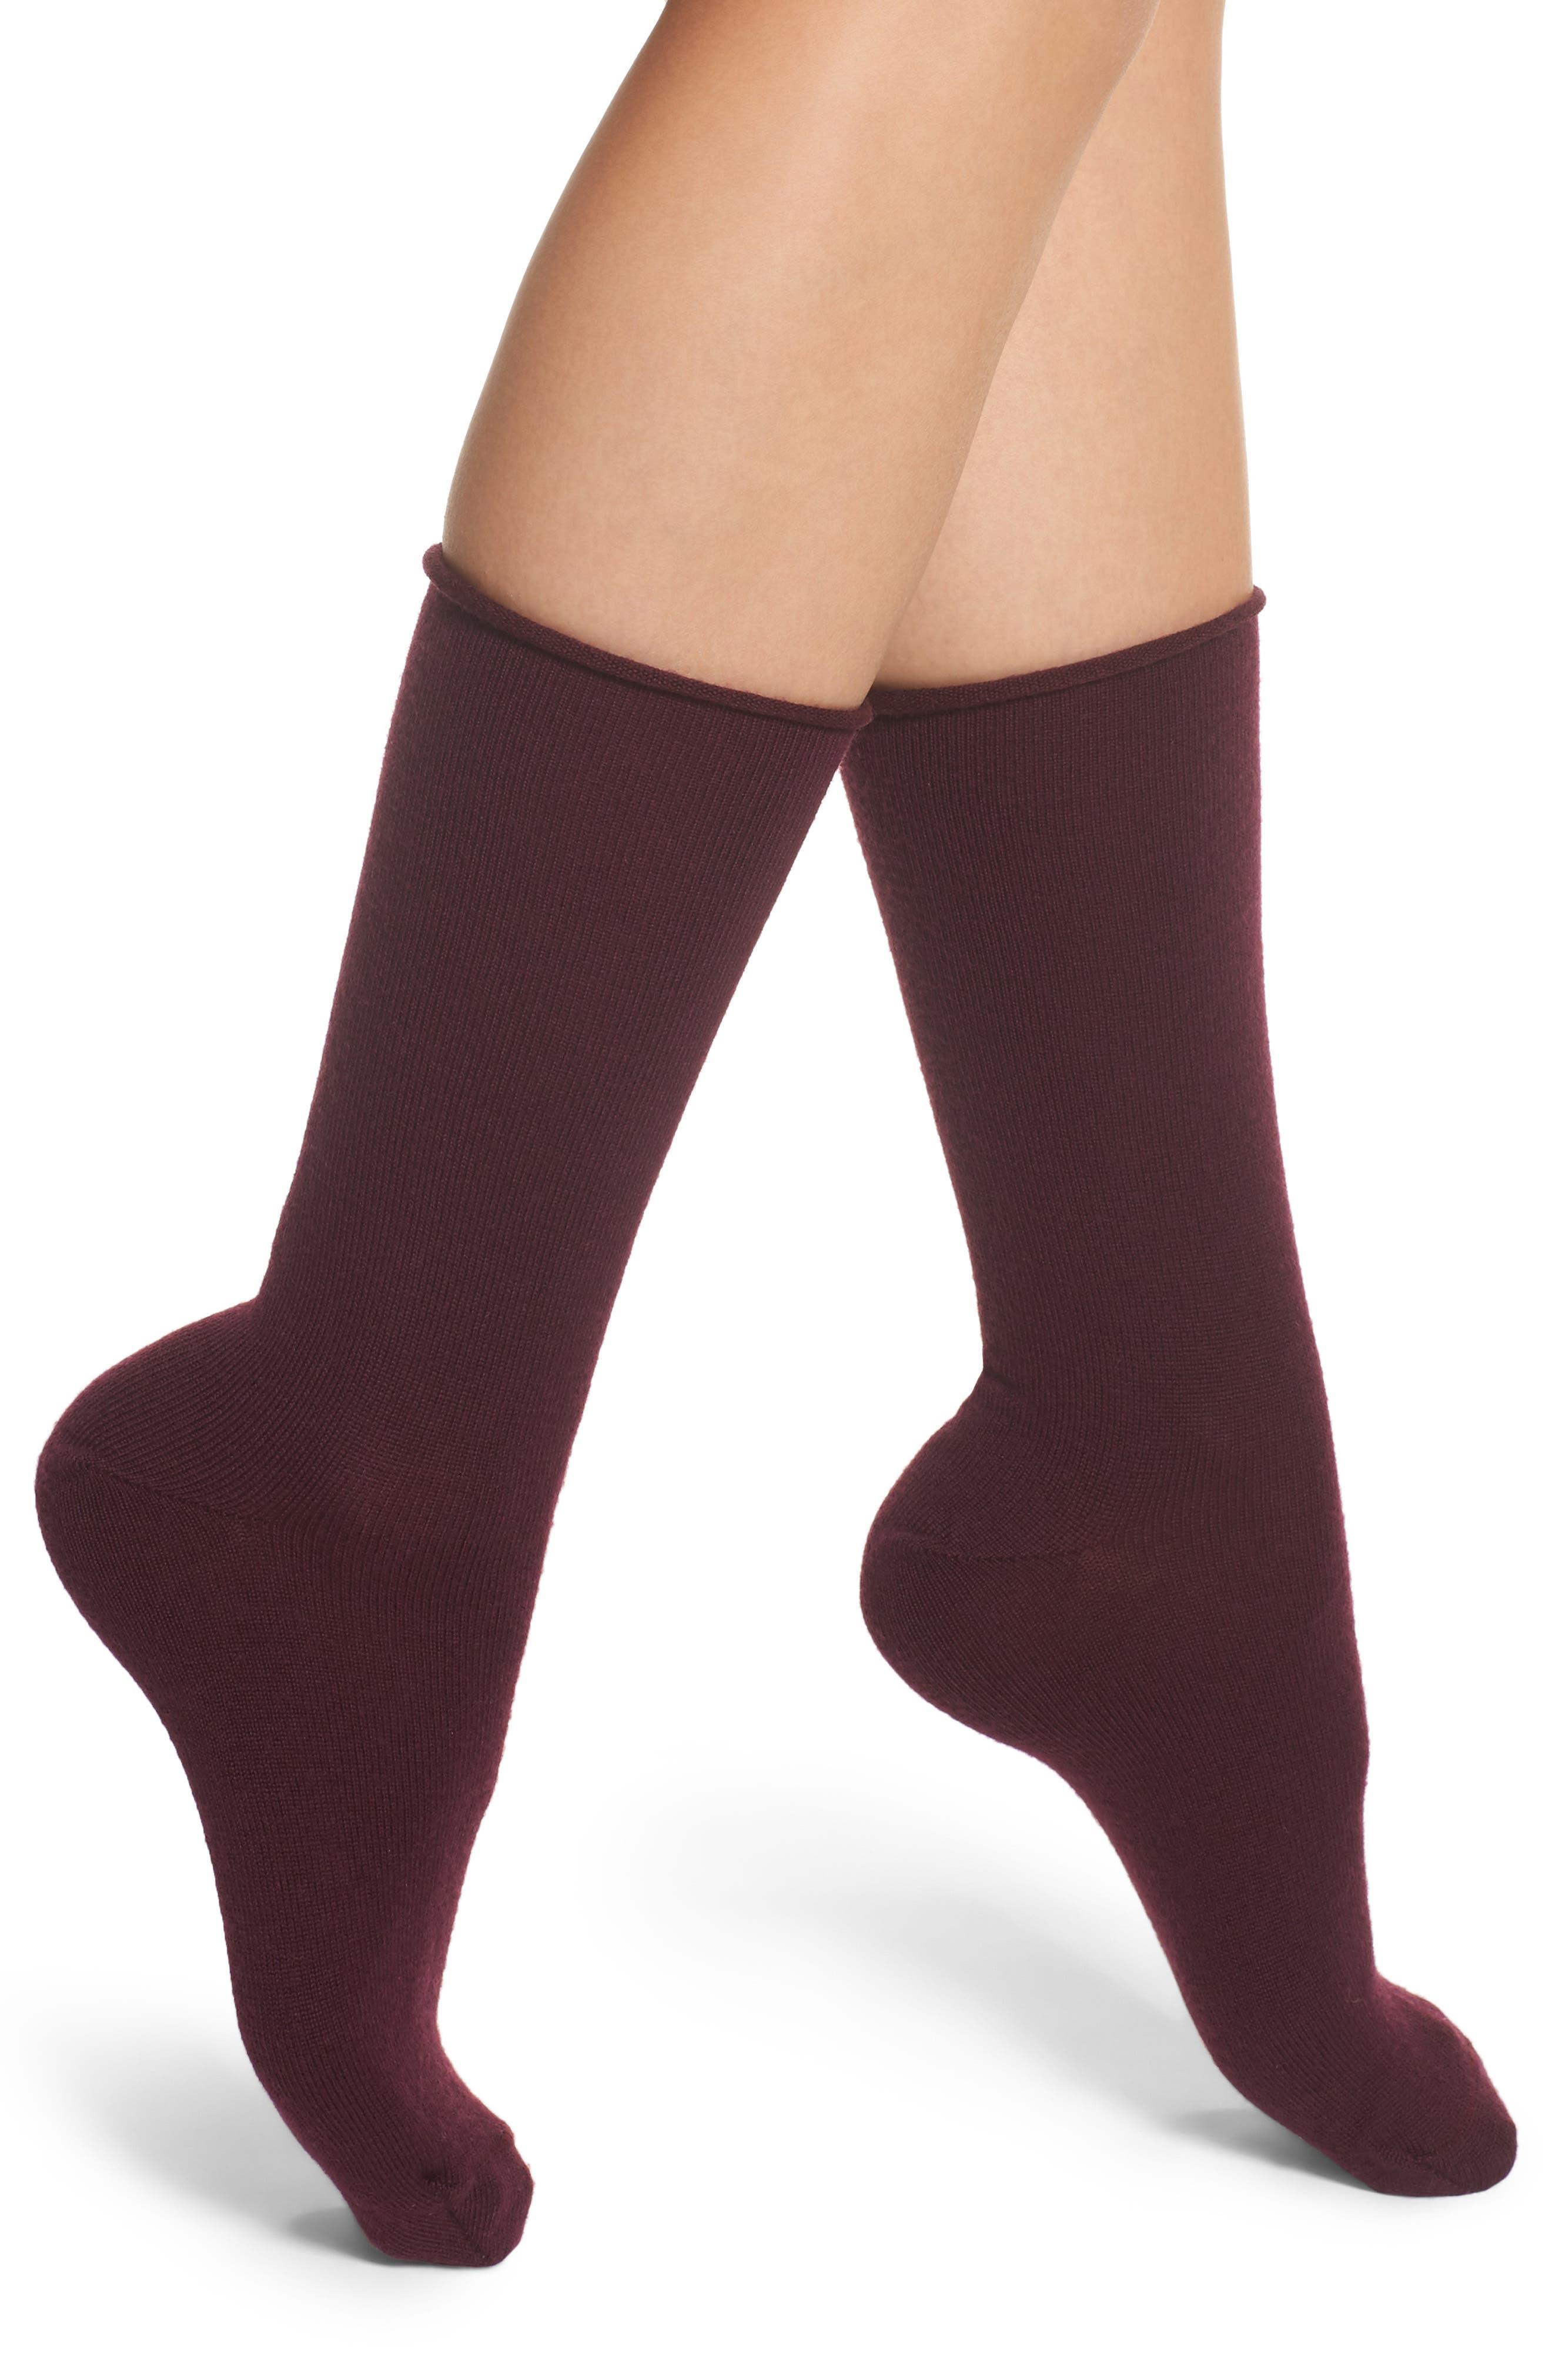 Nordstrom Merino Wool Roll Top Crew Socks